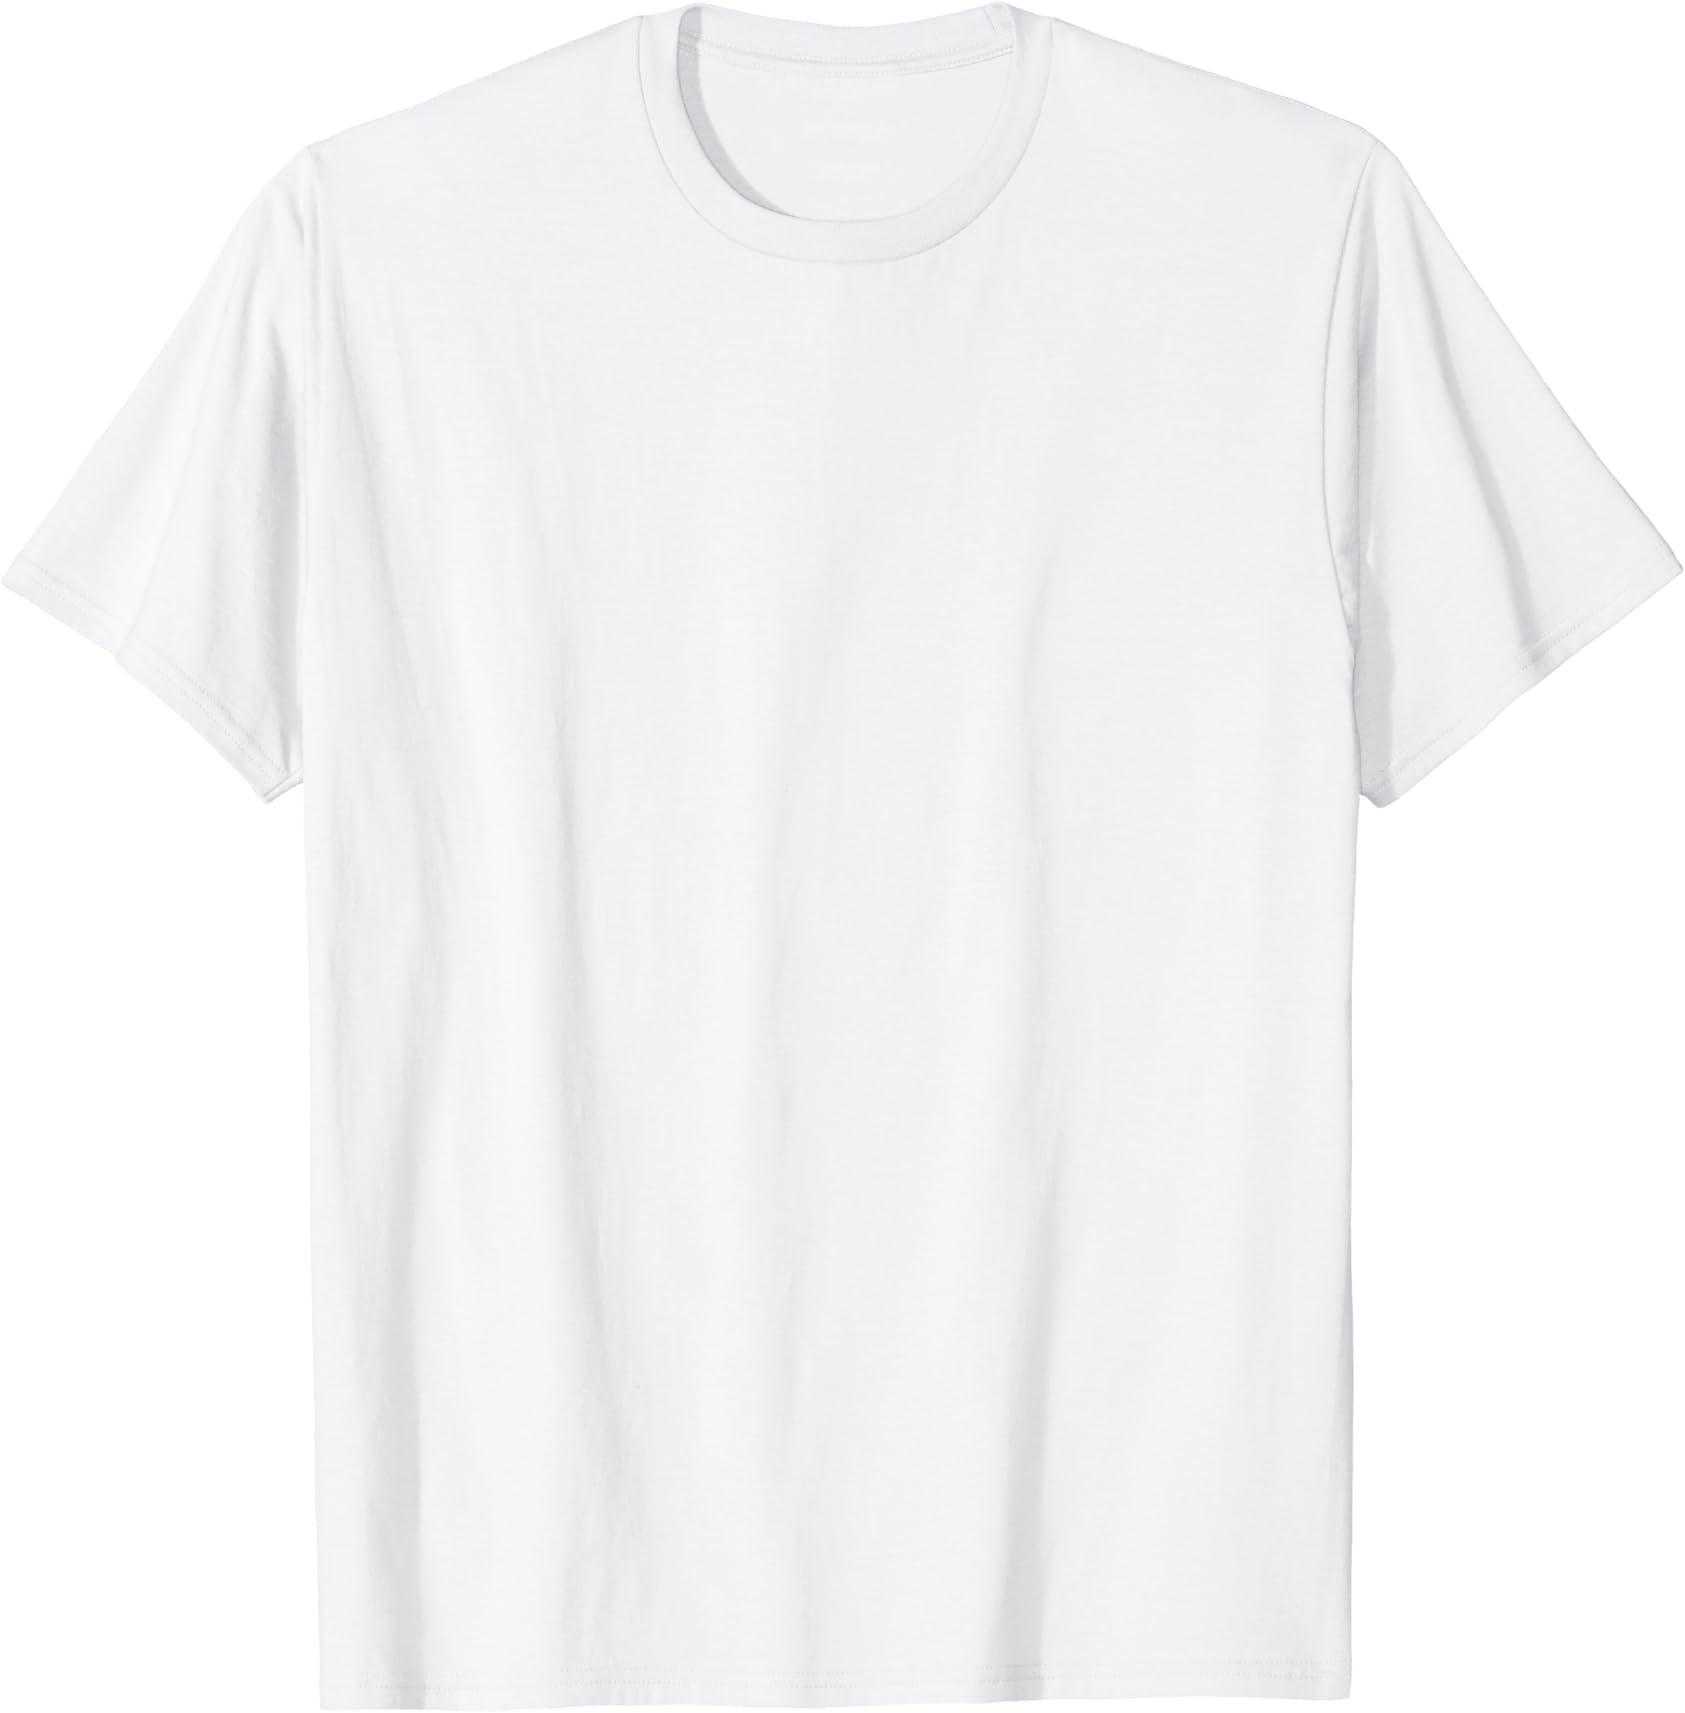 Funny Sarcastic Cool Tee Nice Top T-Shirt